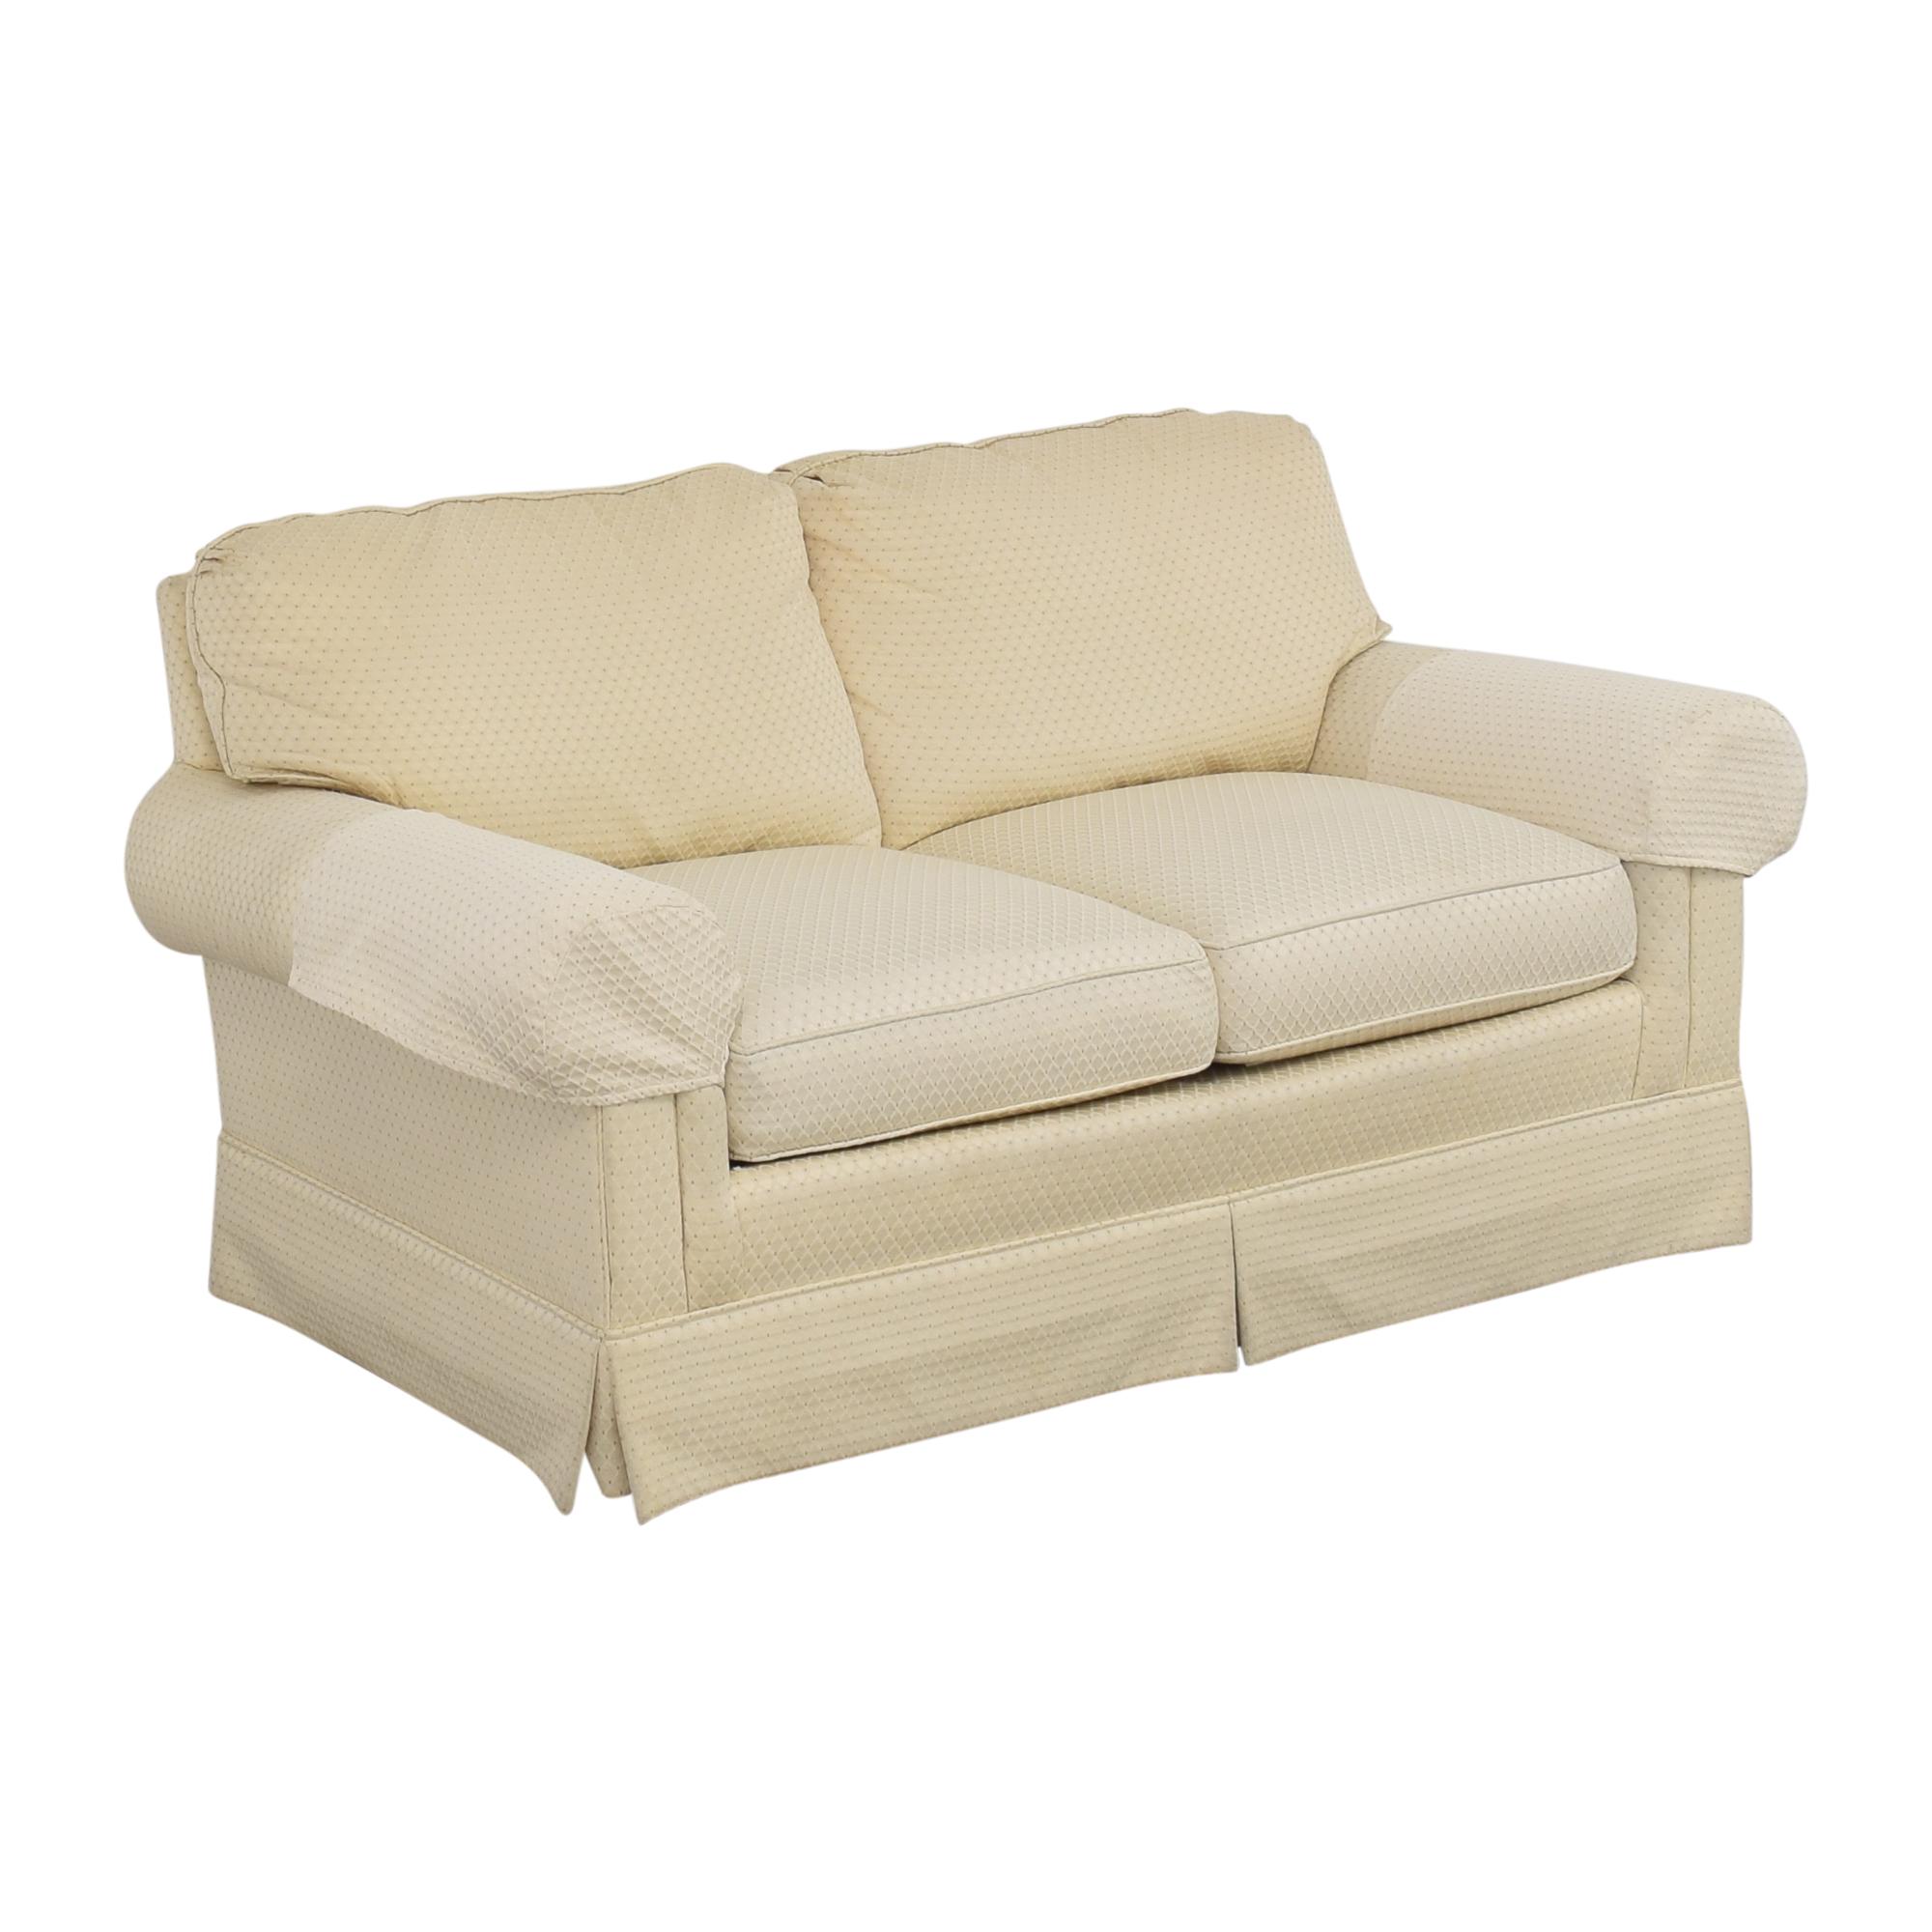 shop Thomasville Thomasville Two Cushion Loveseat online